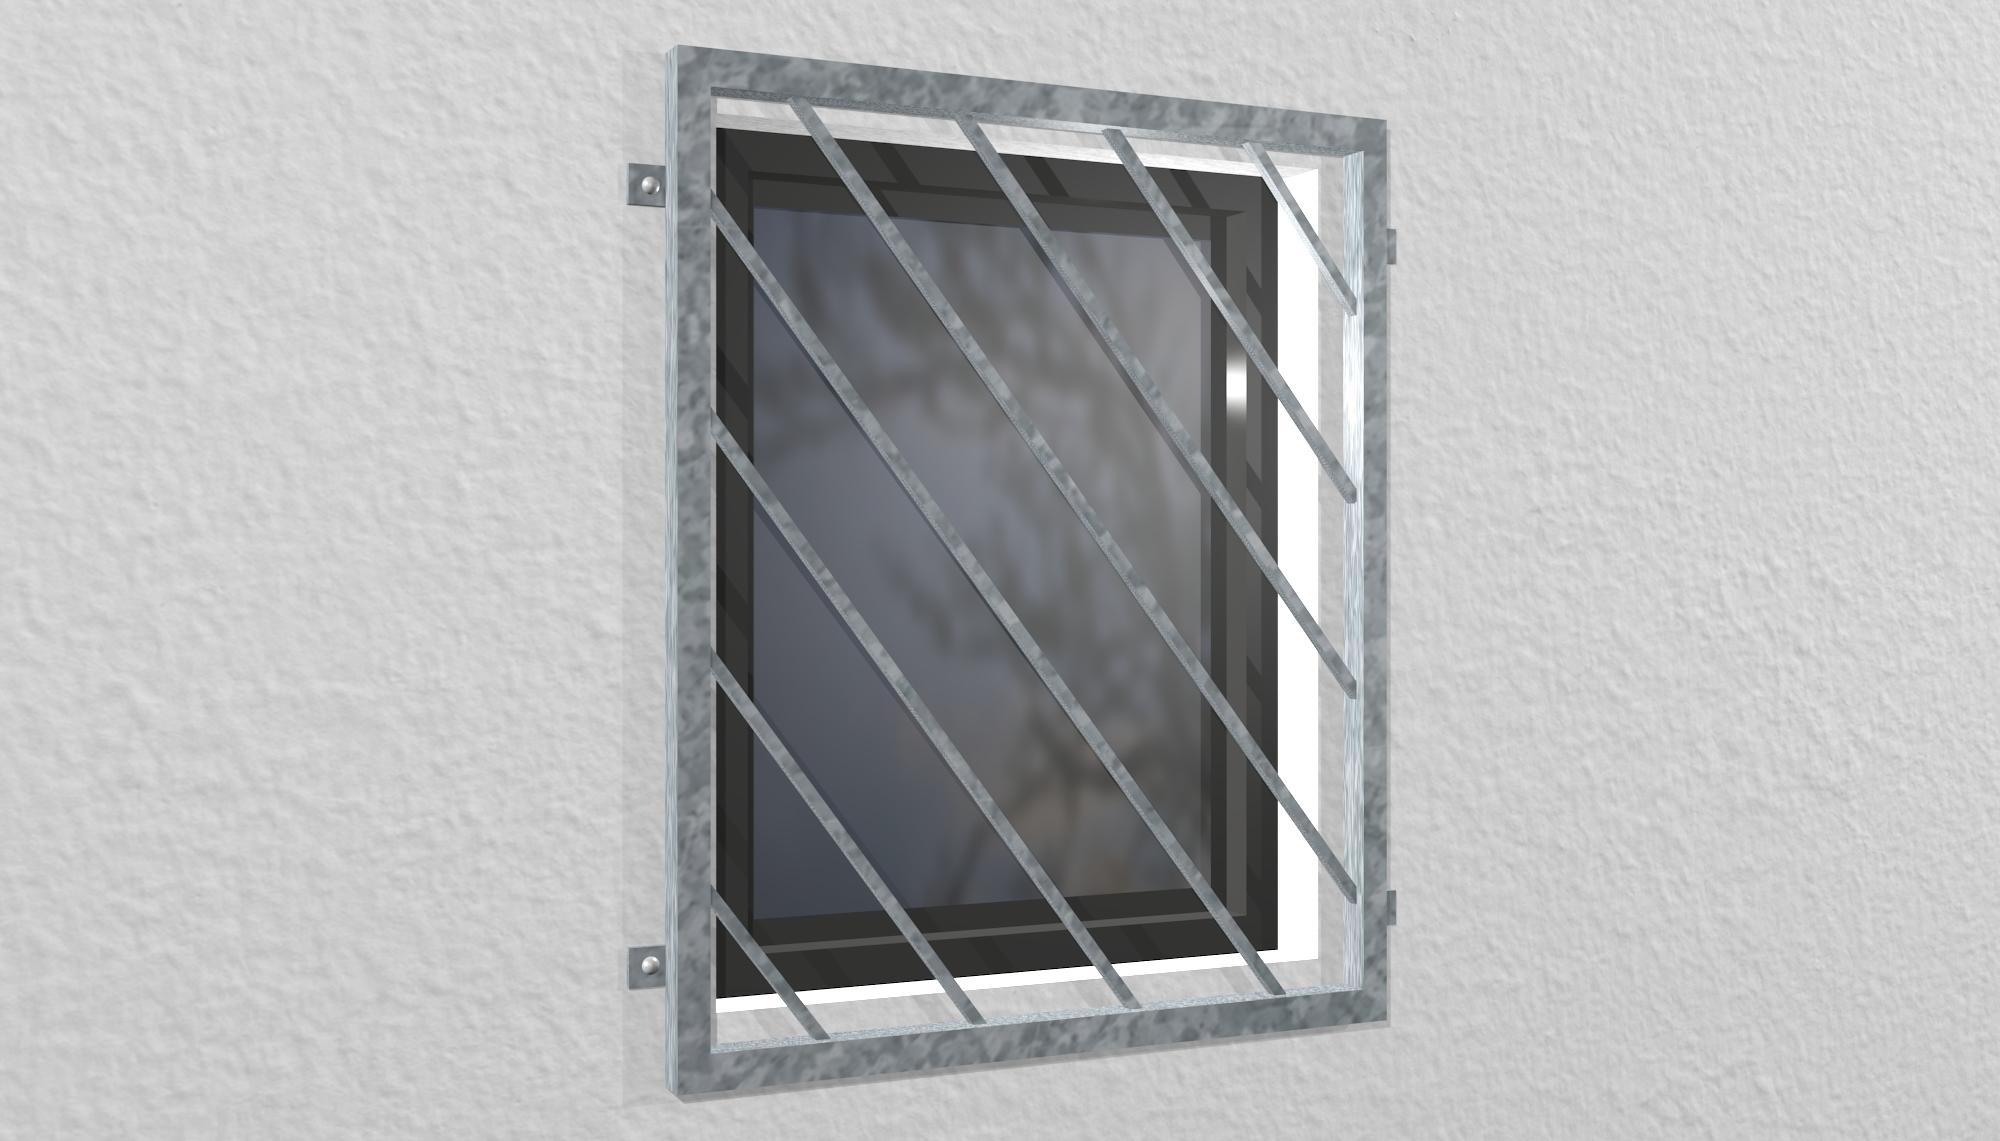 Fenstergitter verzinkt Diagonalstab 2